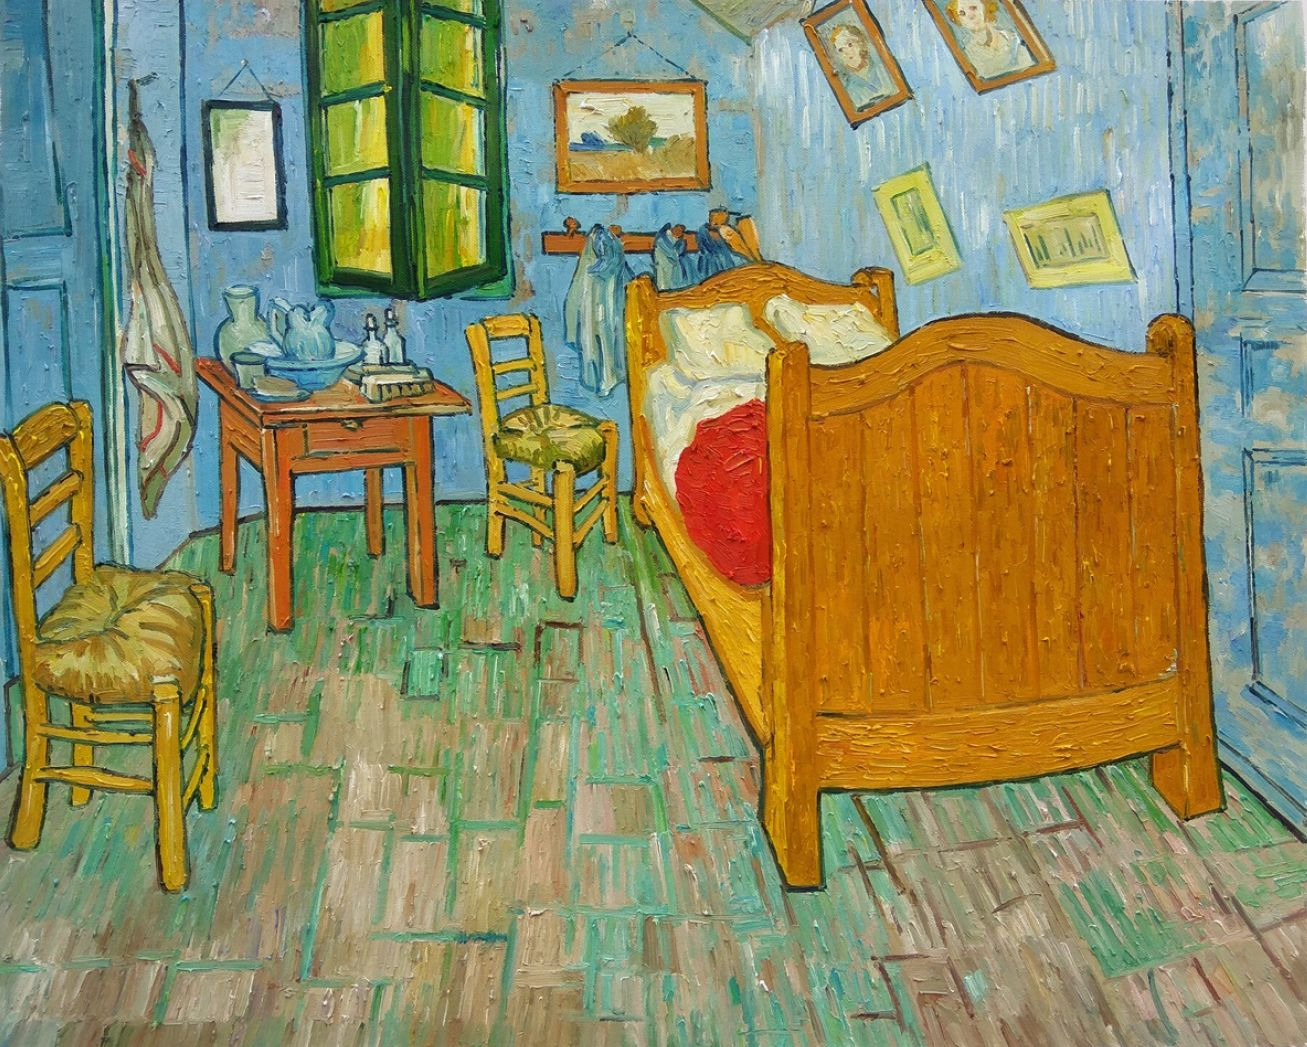 Van Gogh's Bedroom Chicago reproduction